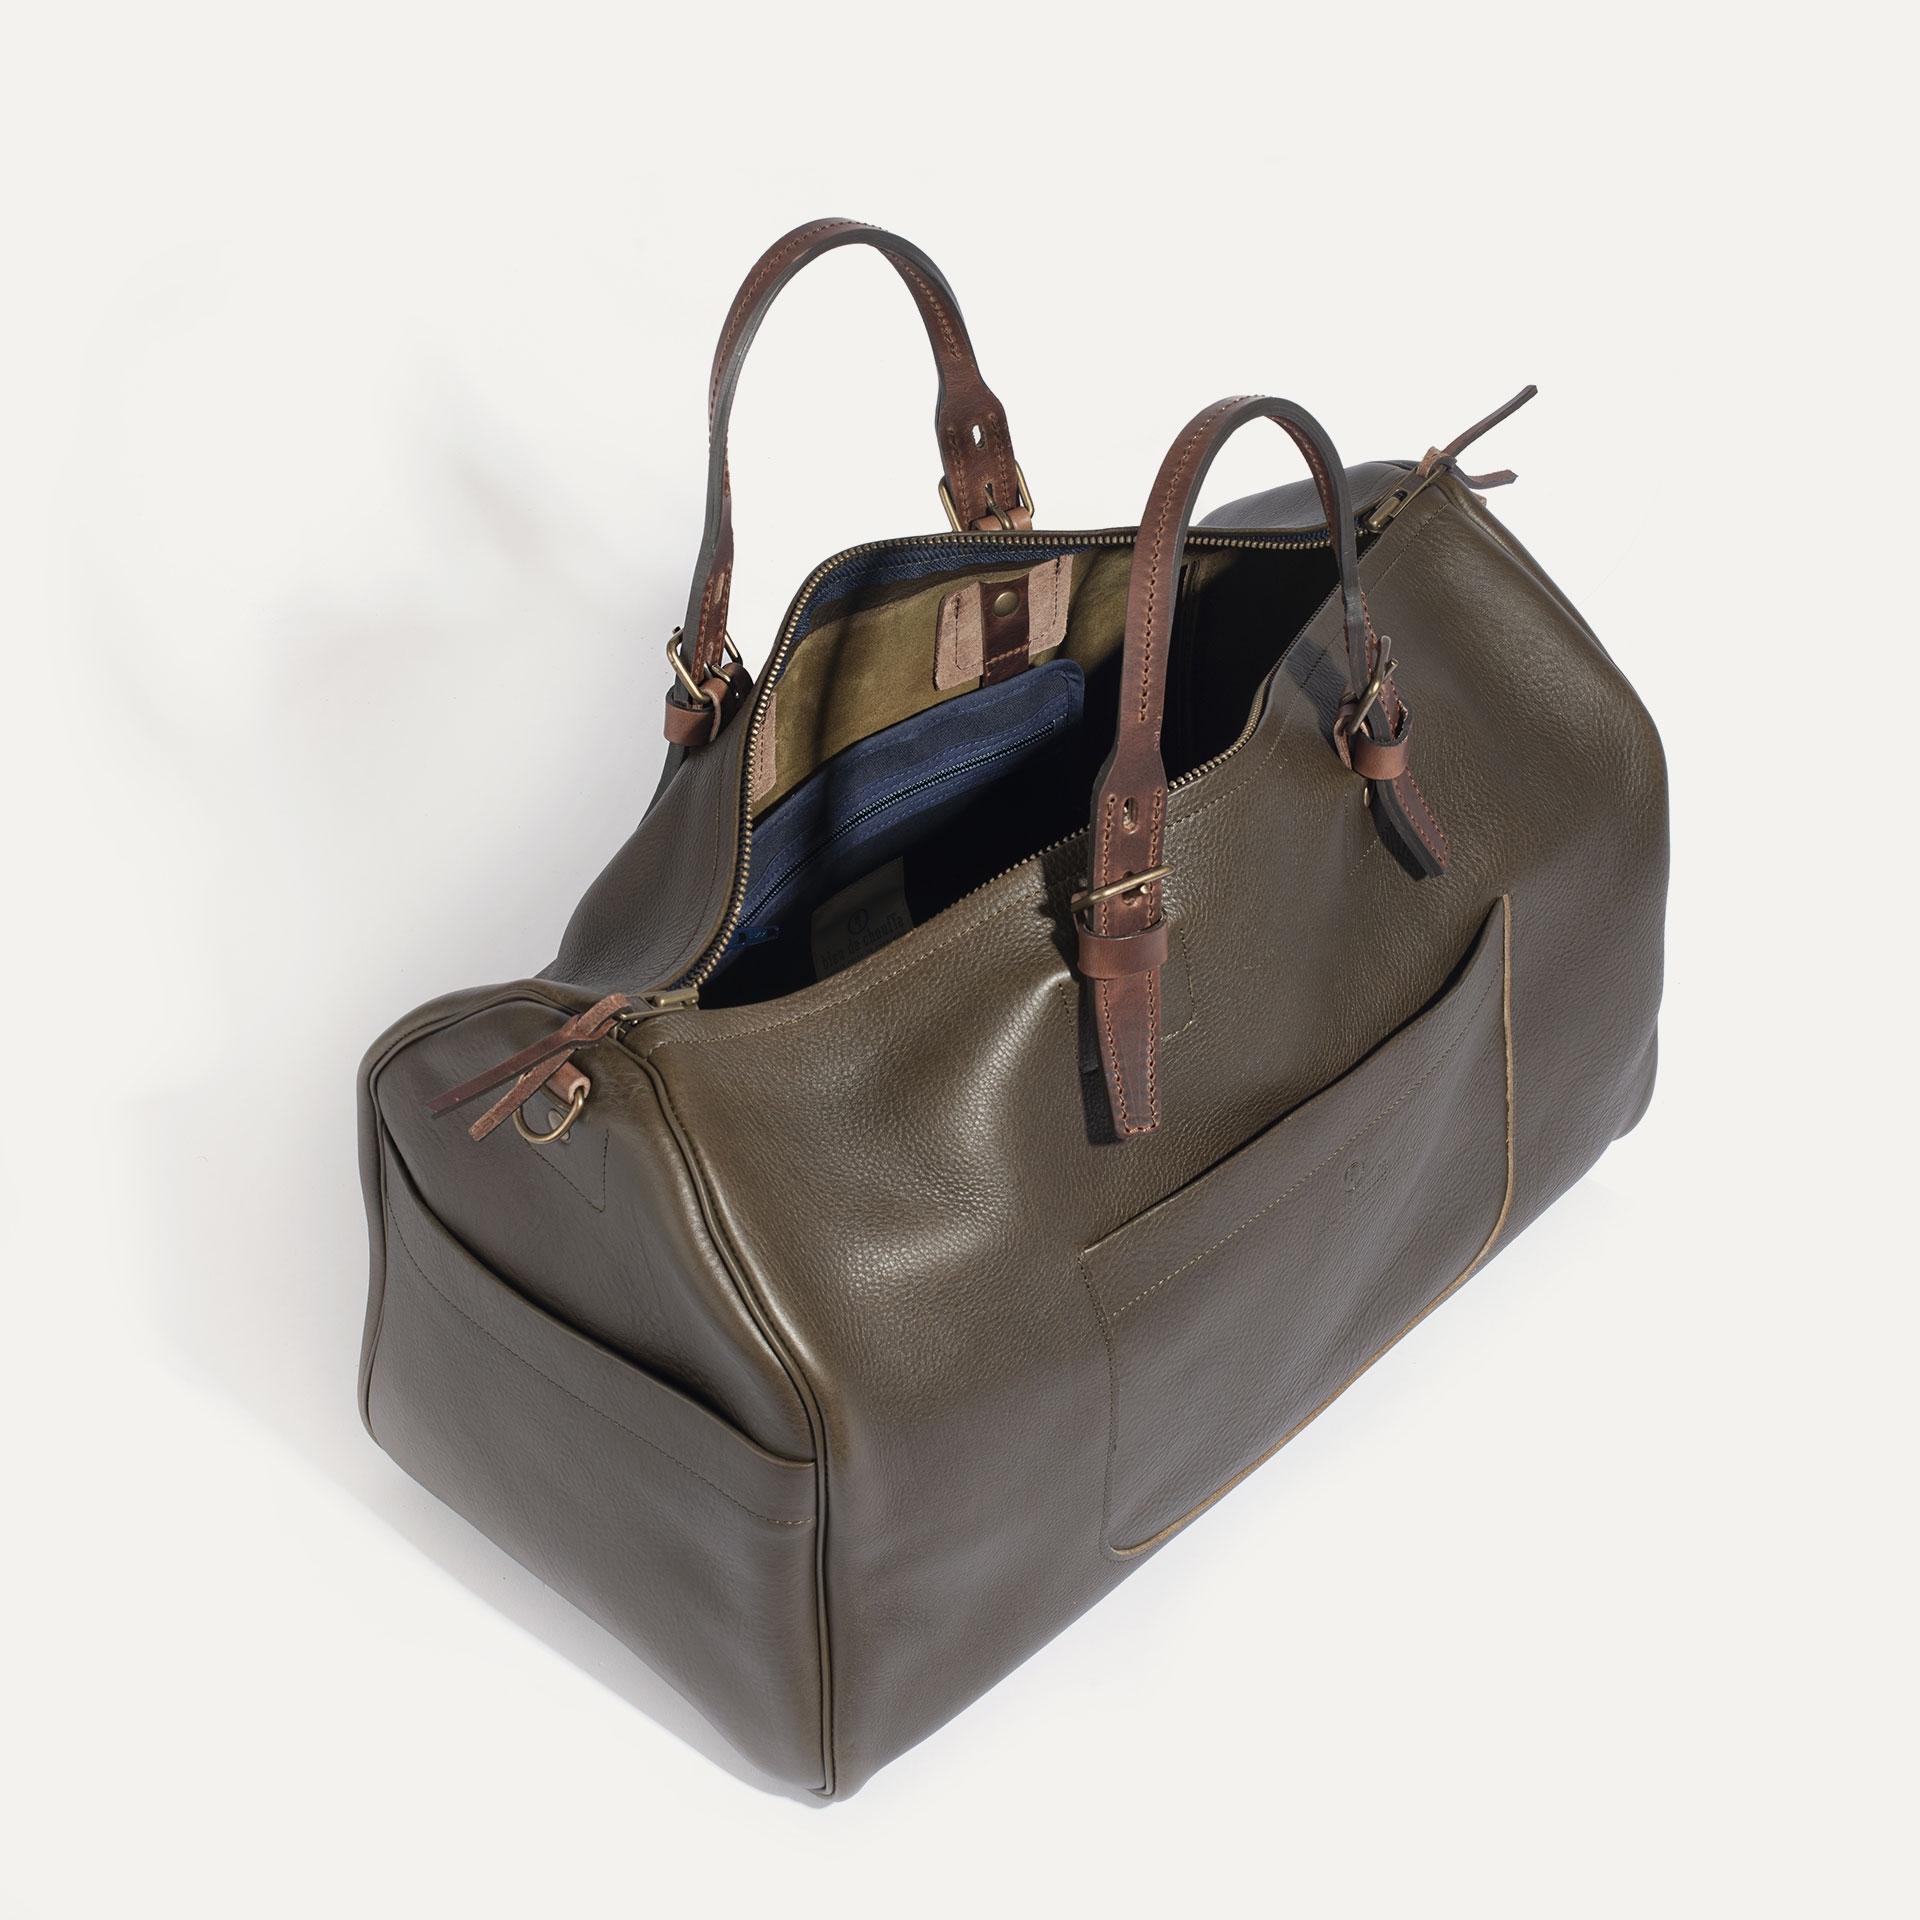 Hobo Travel bag - Khaki (image n°4)